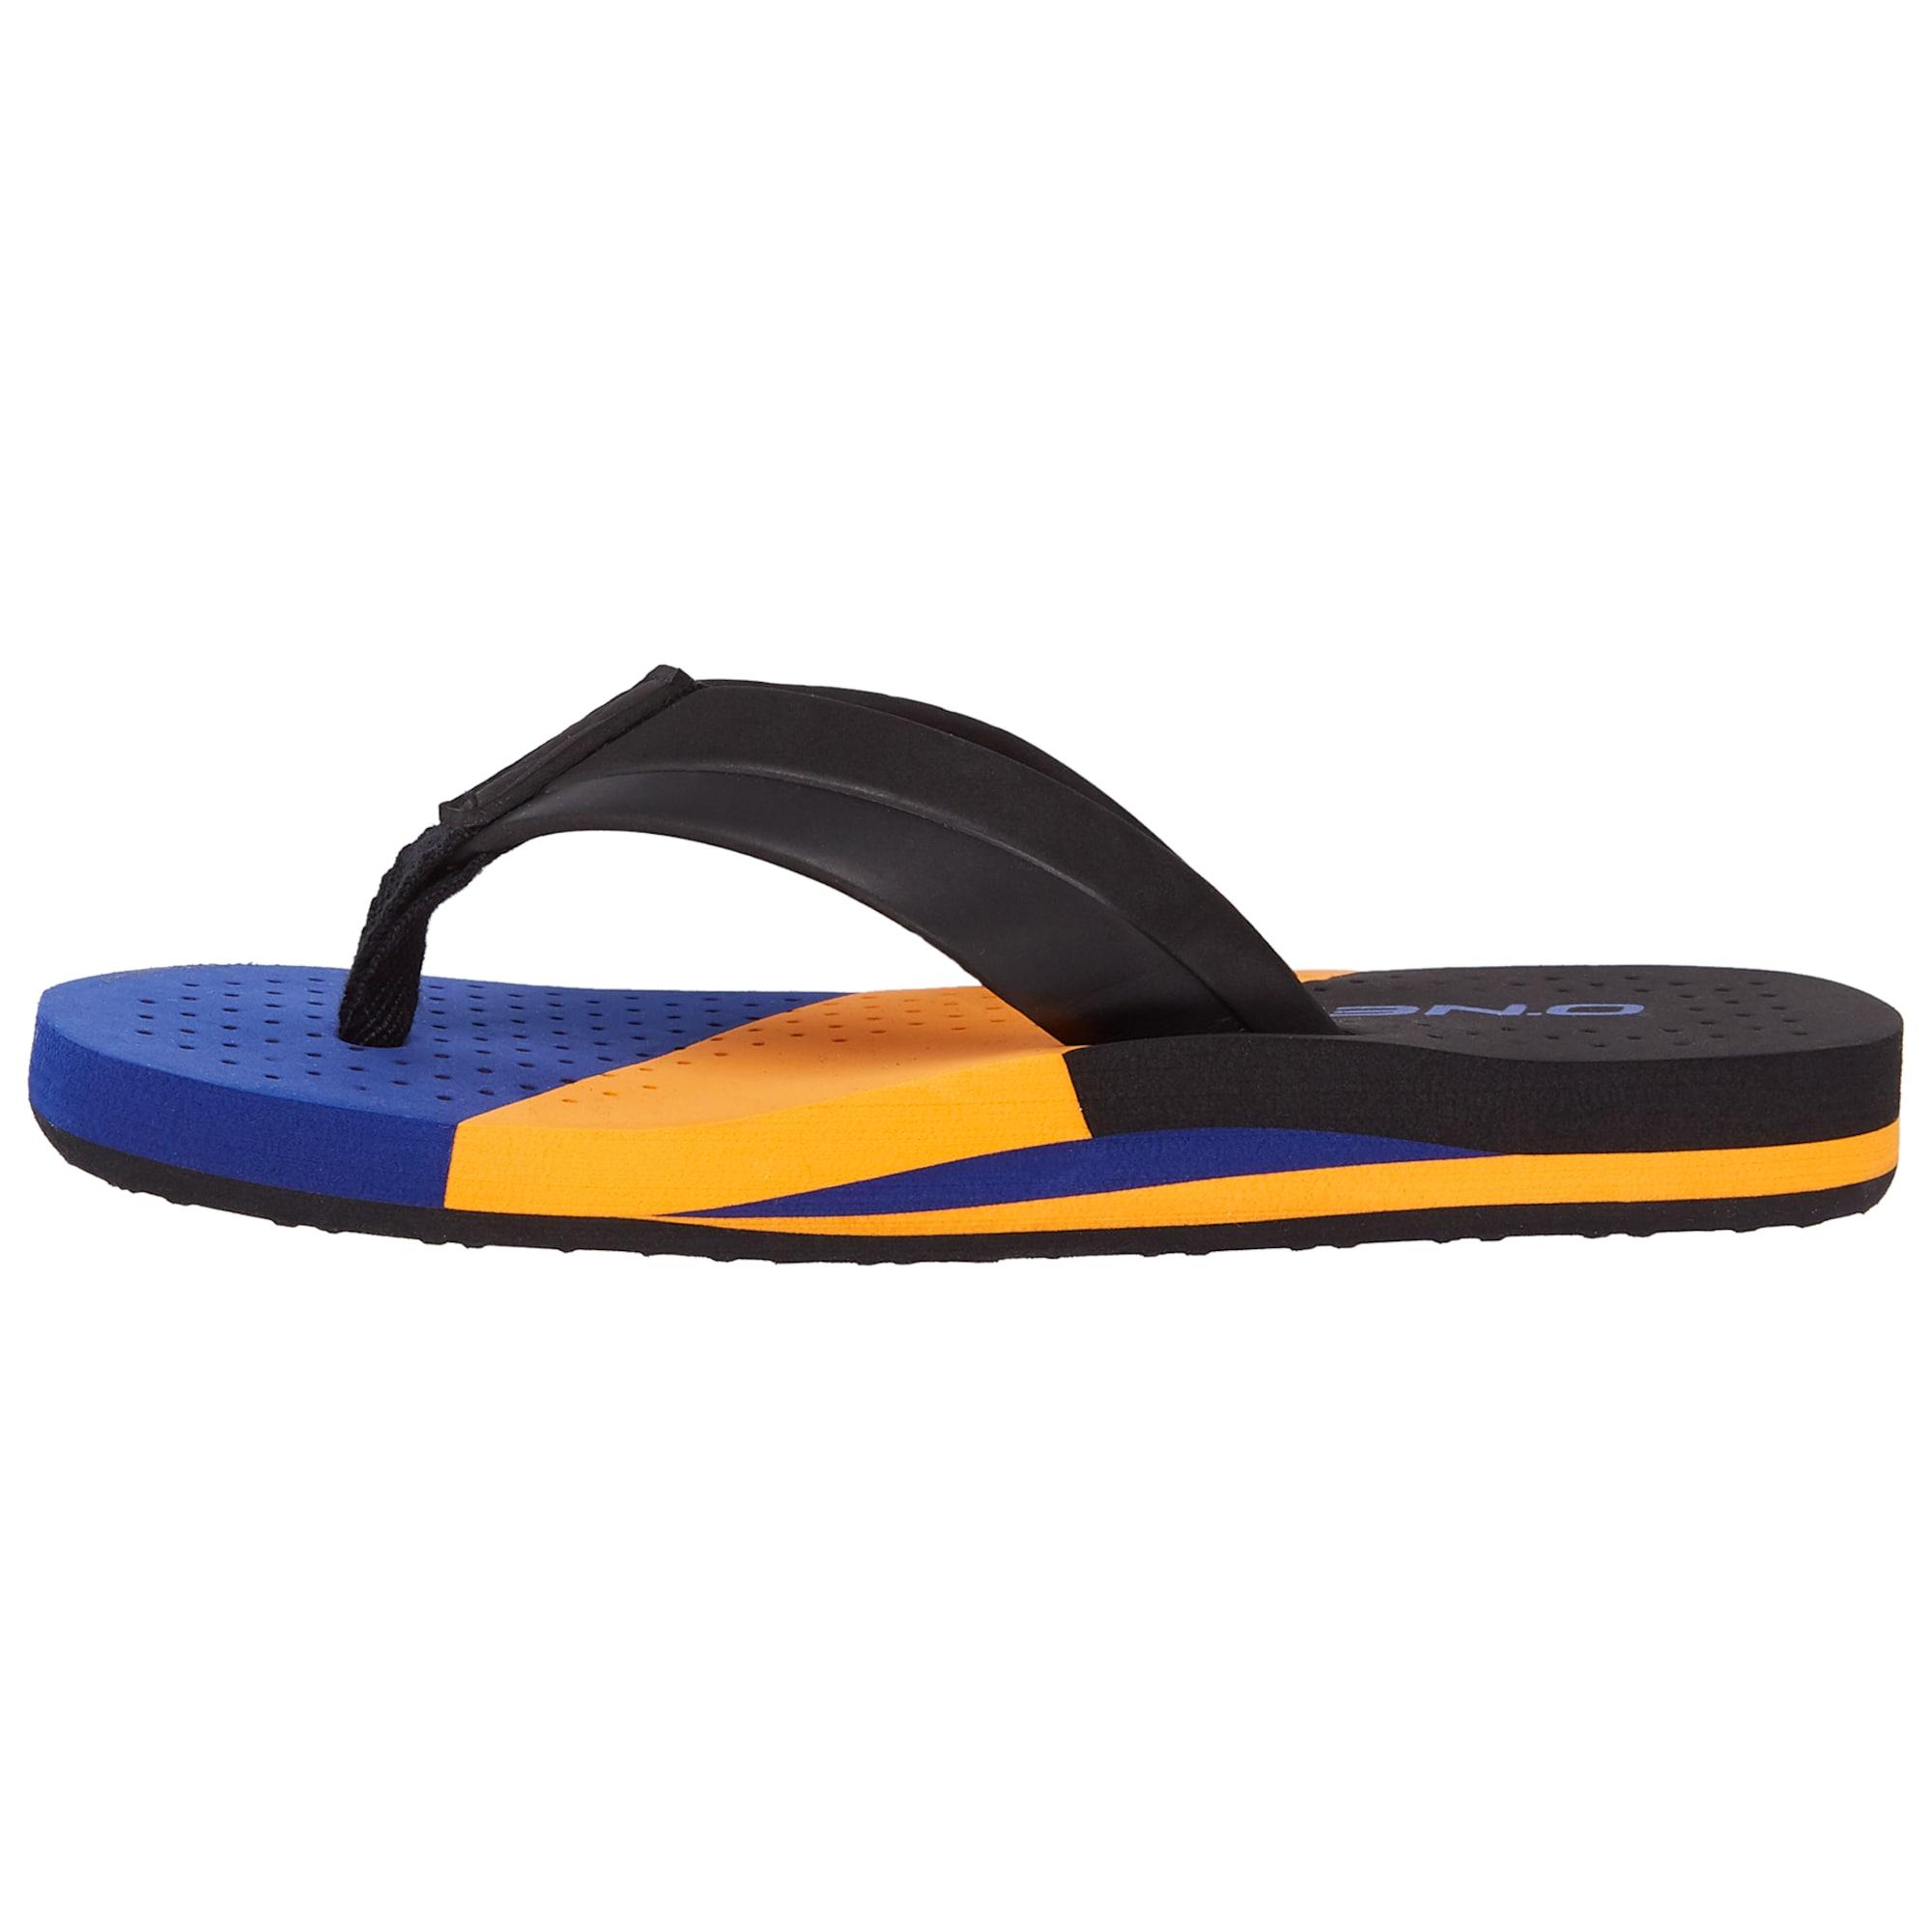 ONEILL Otevřená obuv FB IMPRINT PUNCH SANDALS modrá černá O'NEILL